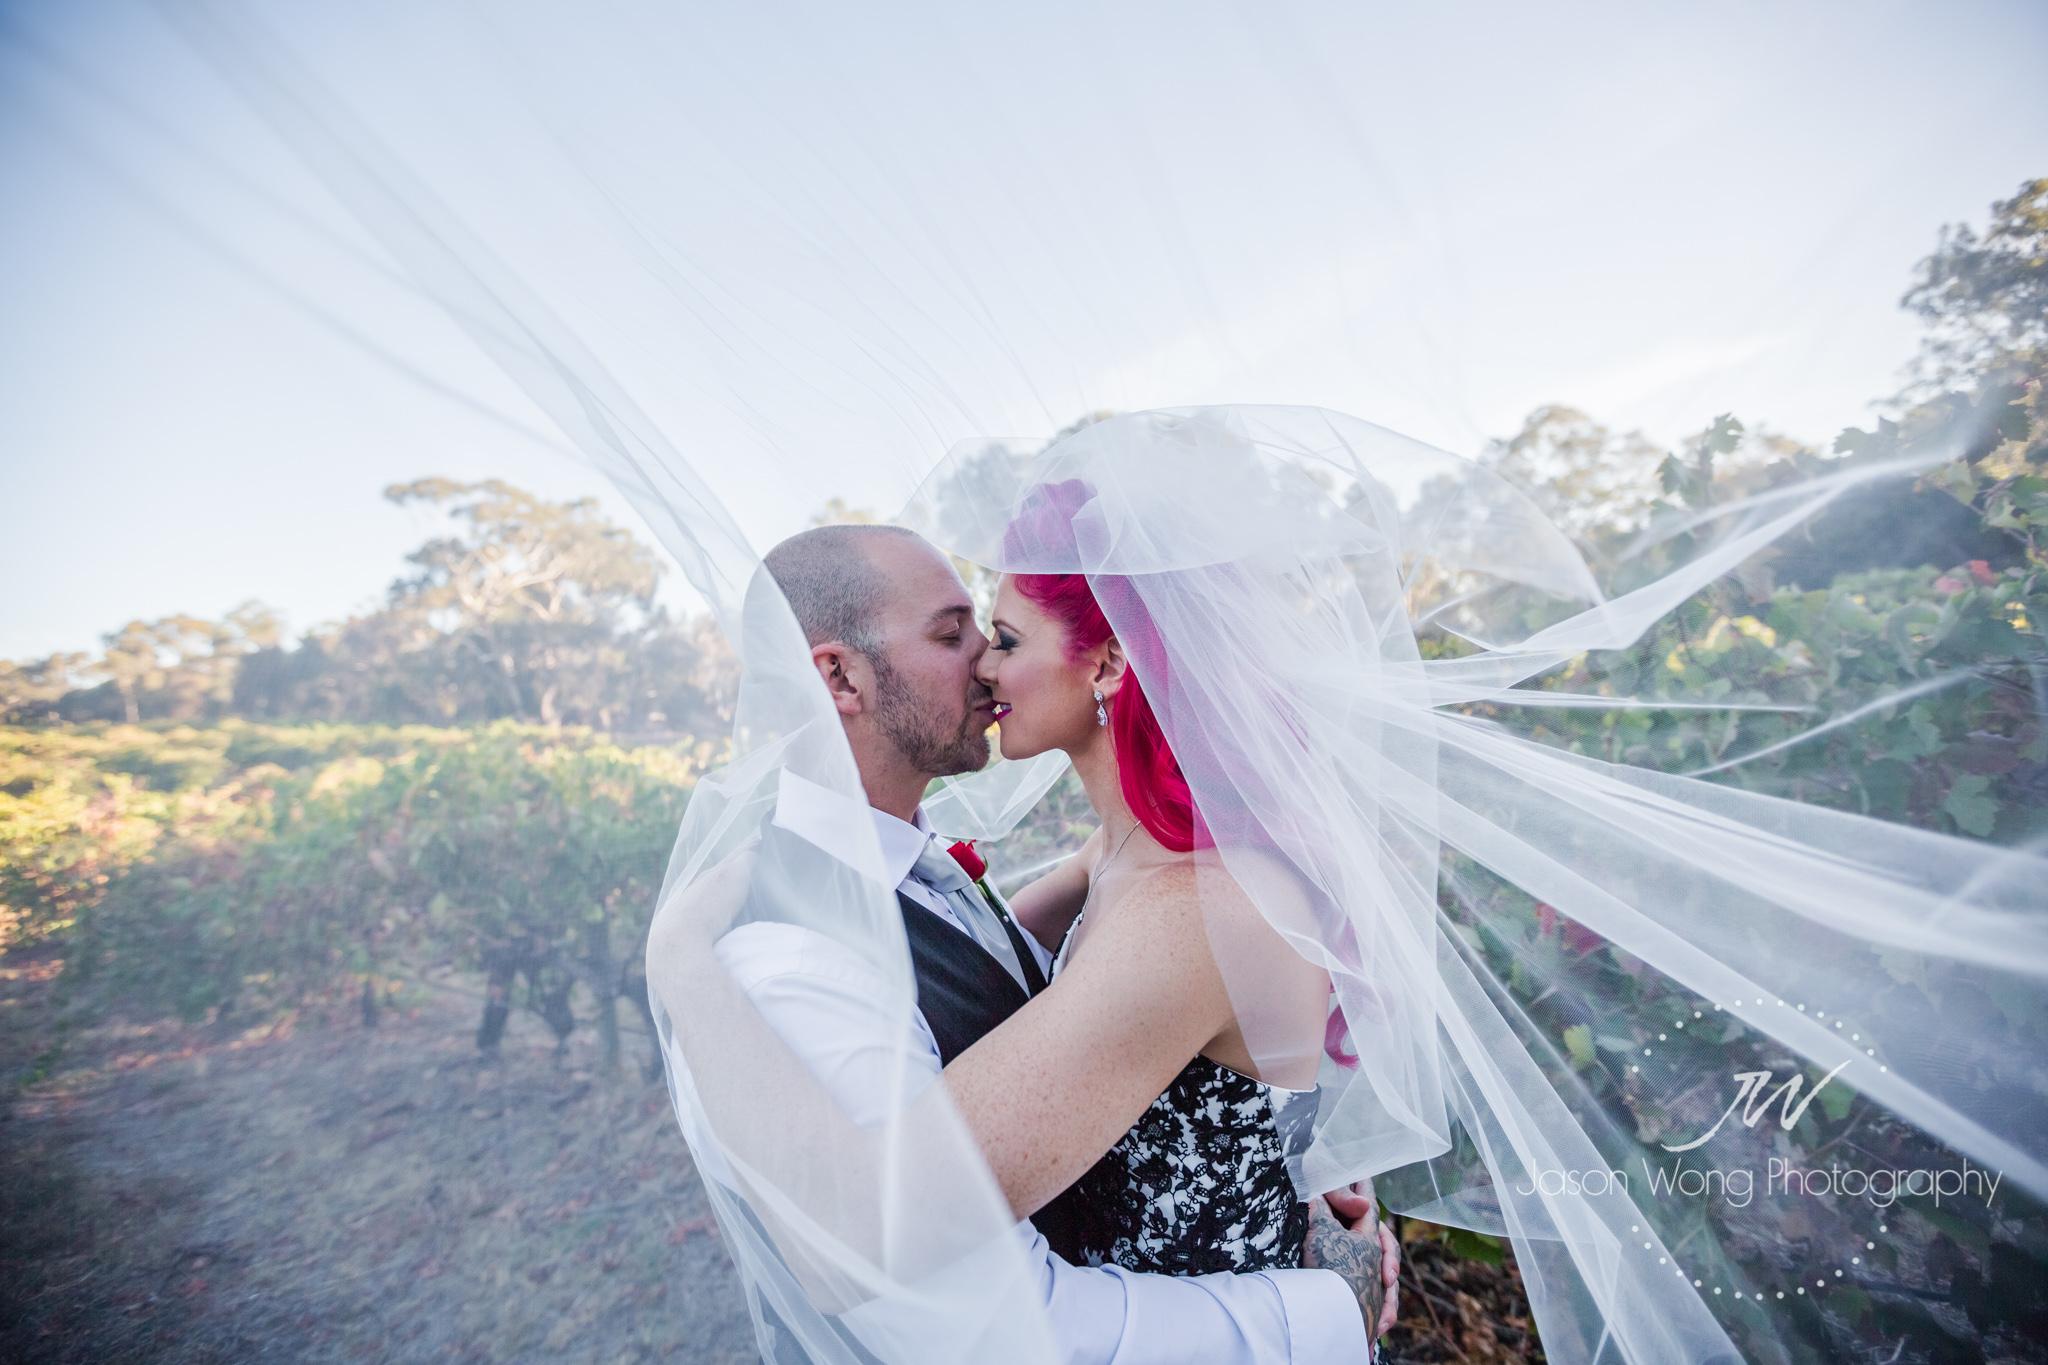 kiss-inside-veil-jason-wong-photography-style.jpg